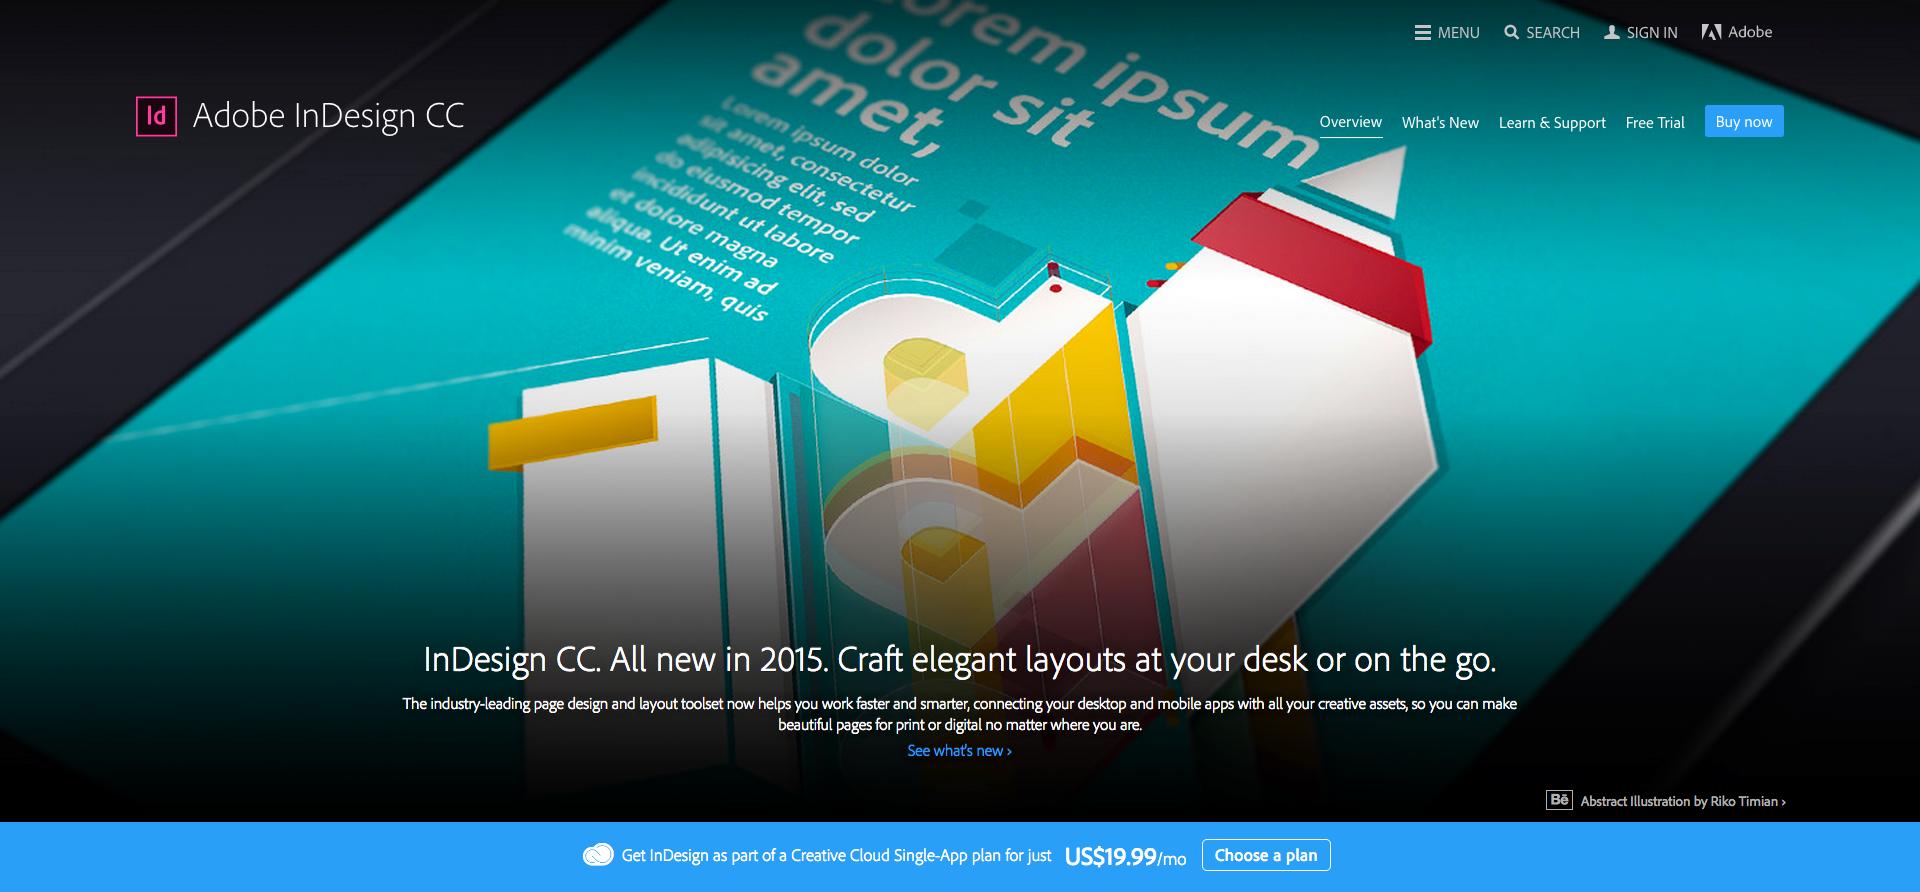 Adobe InDesign CC 2015 Artwork on Behance